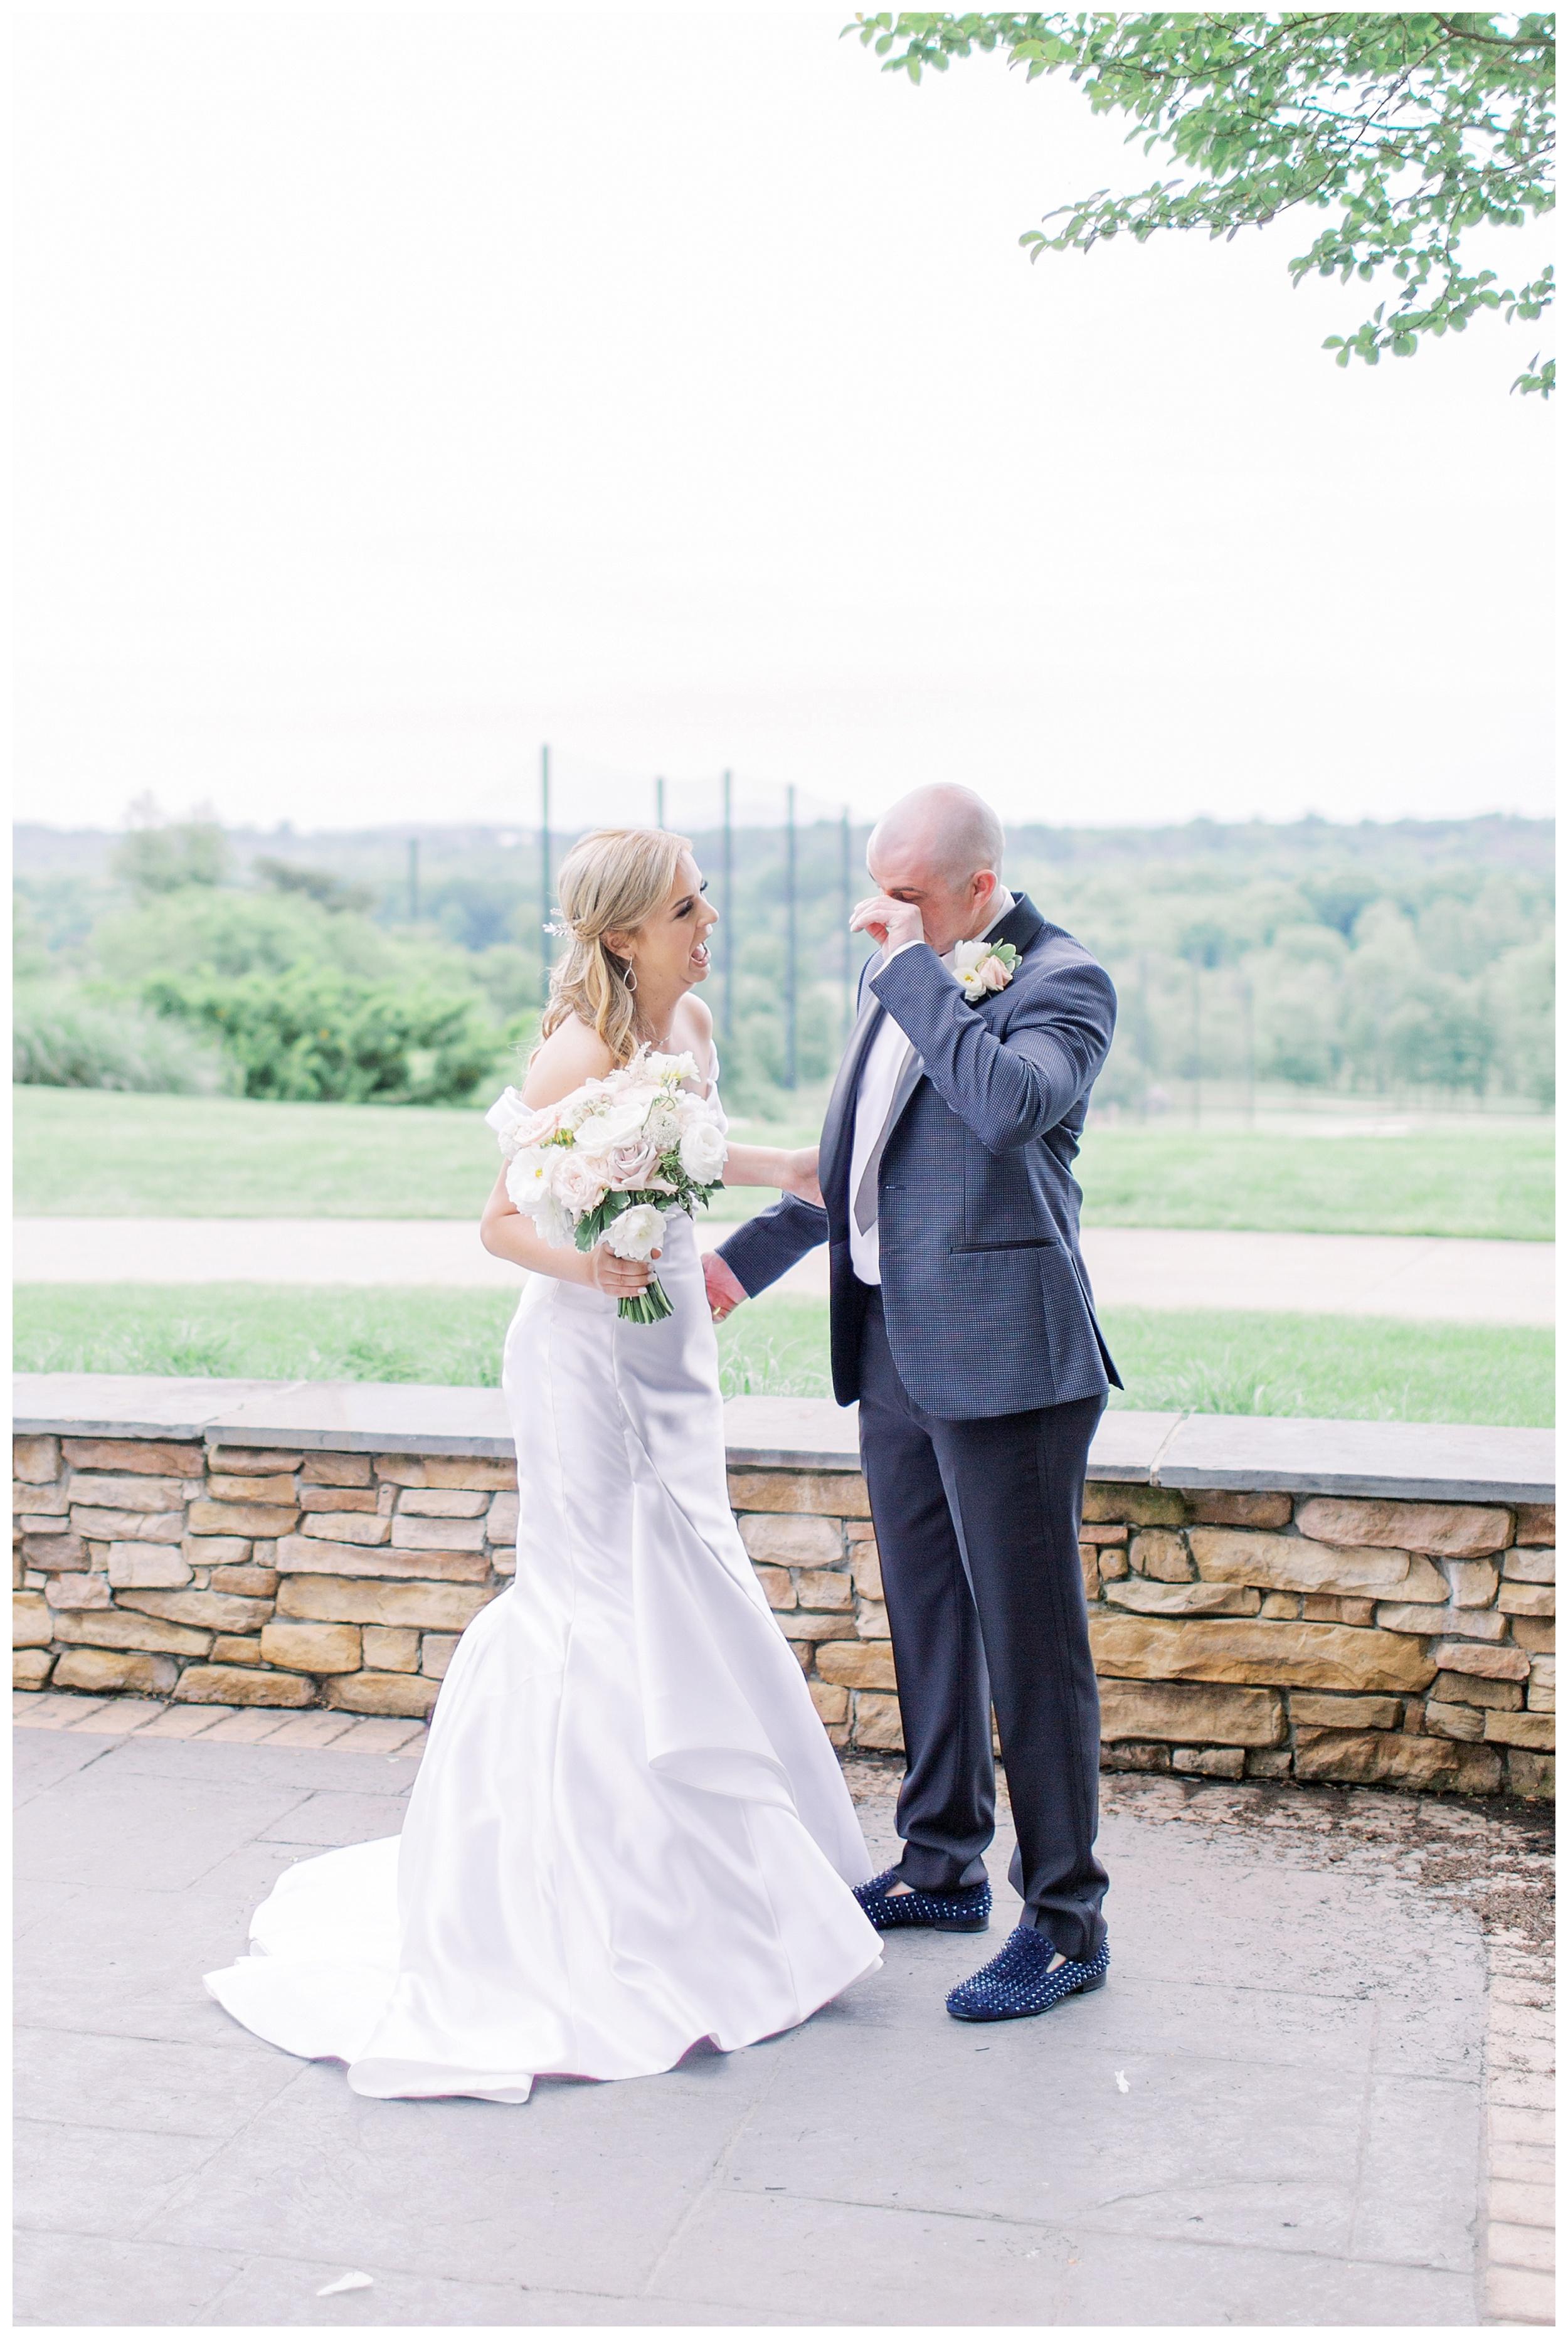 Lansdowne Resort Wedding | Virginia Film Wedding Photographer Kir Tuben_0033.jpg